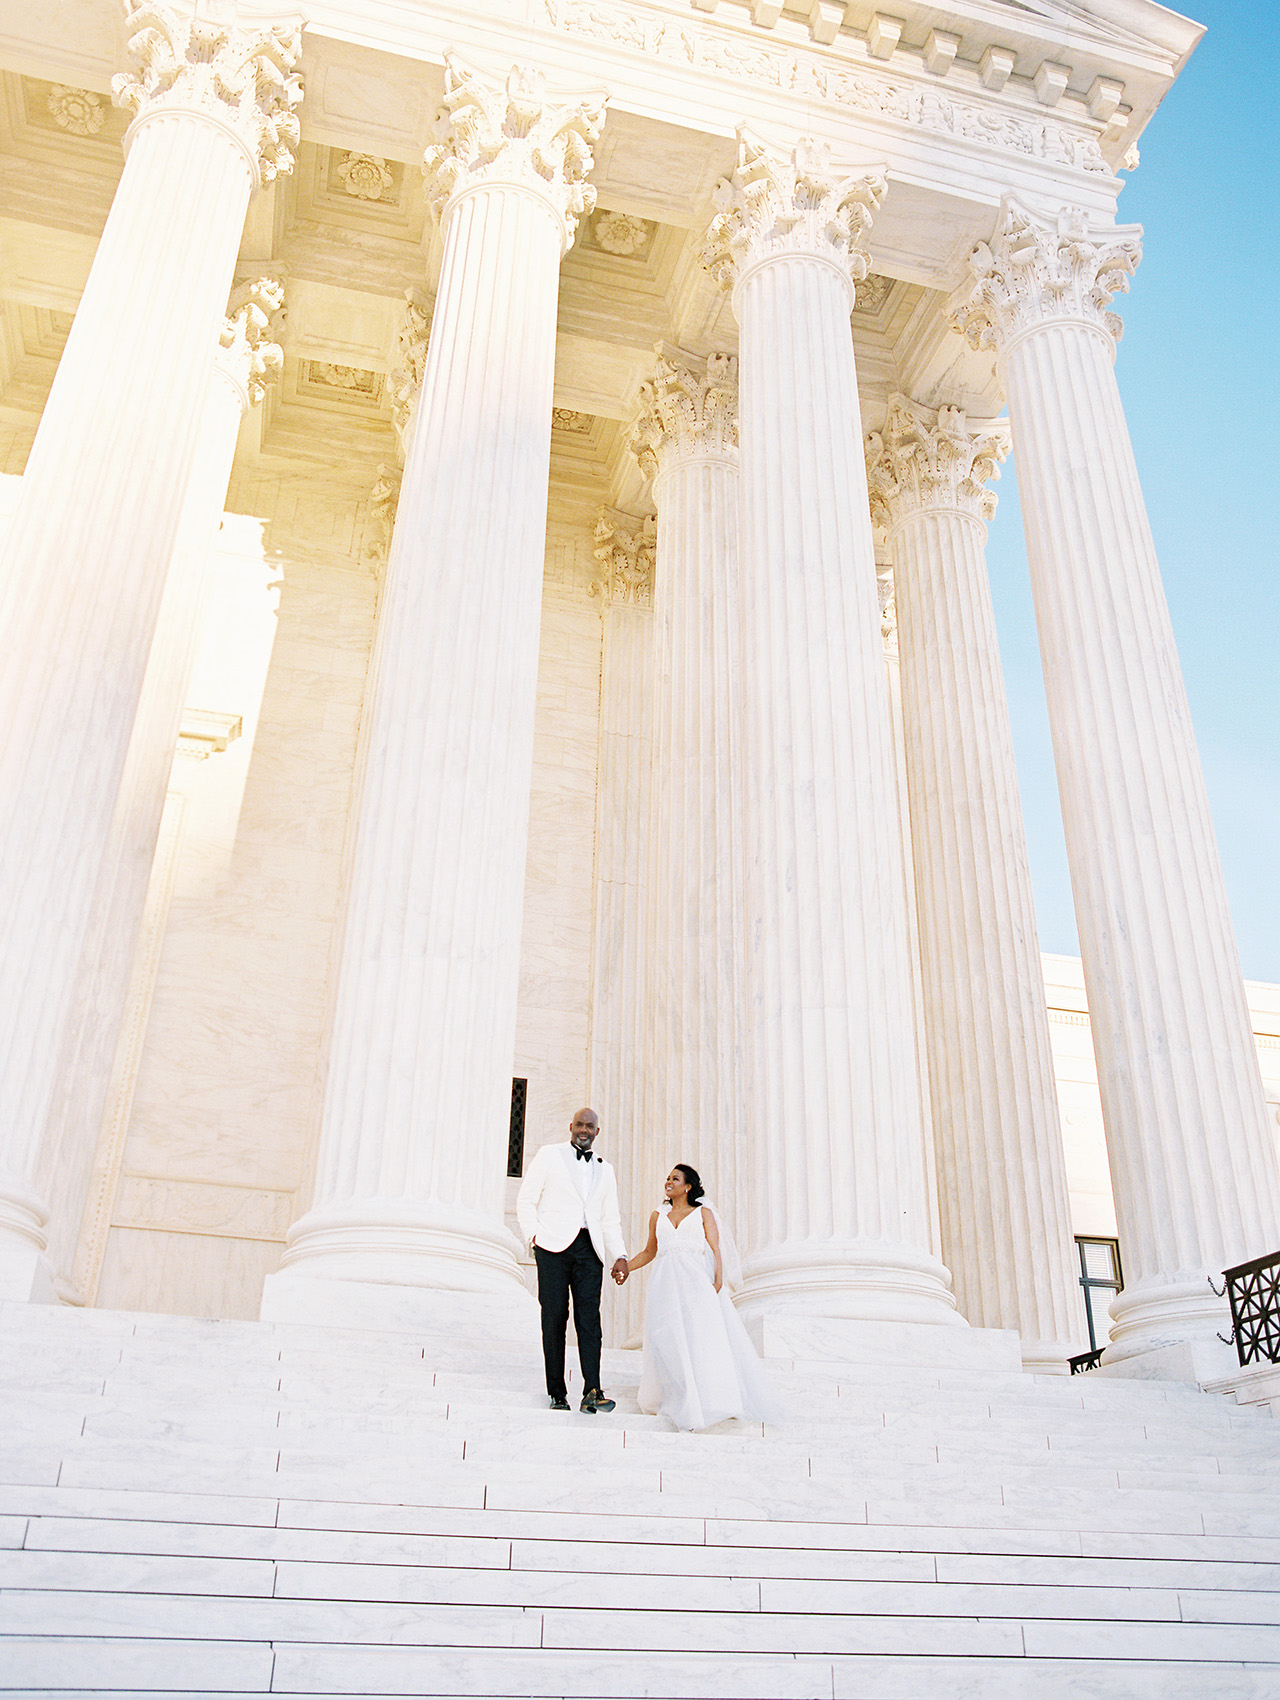 denita john wedding couple monument